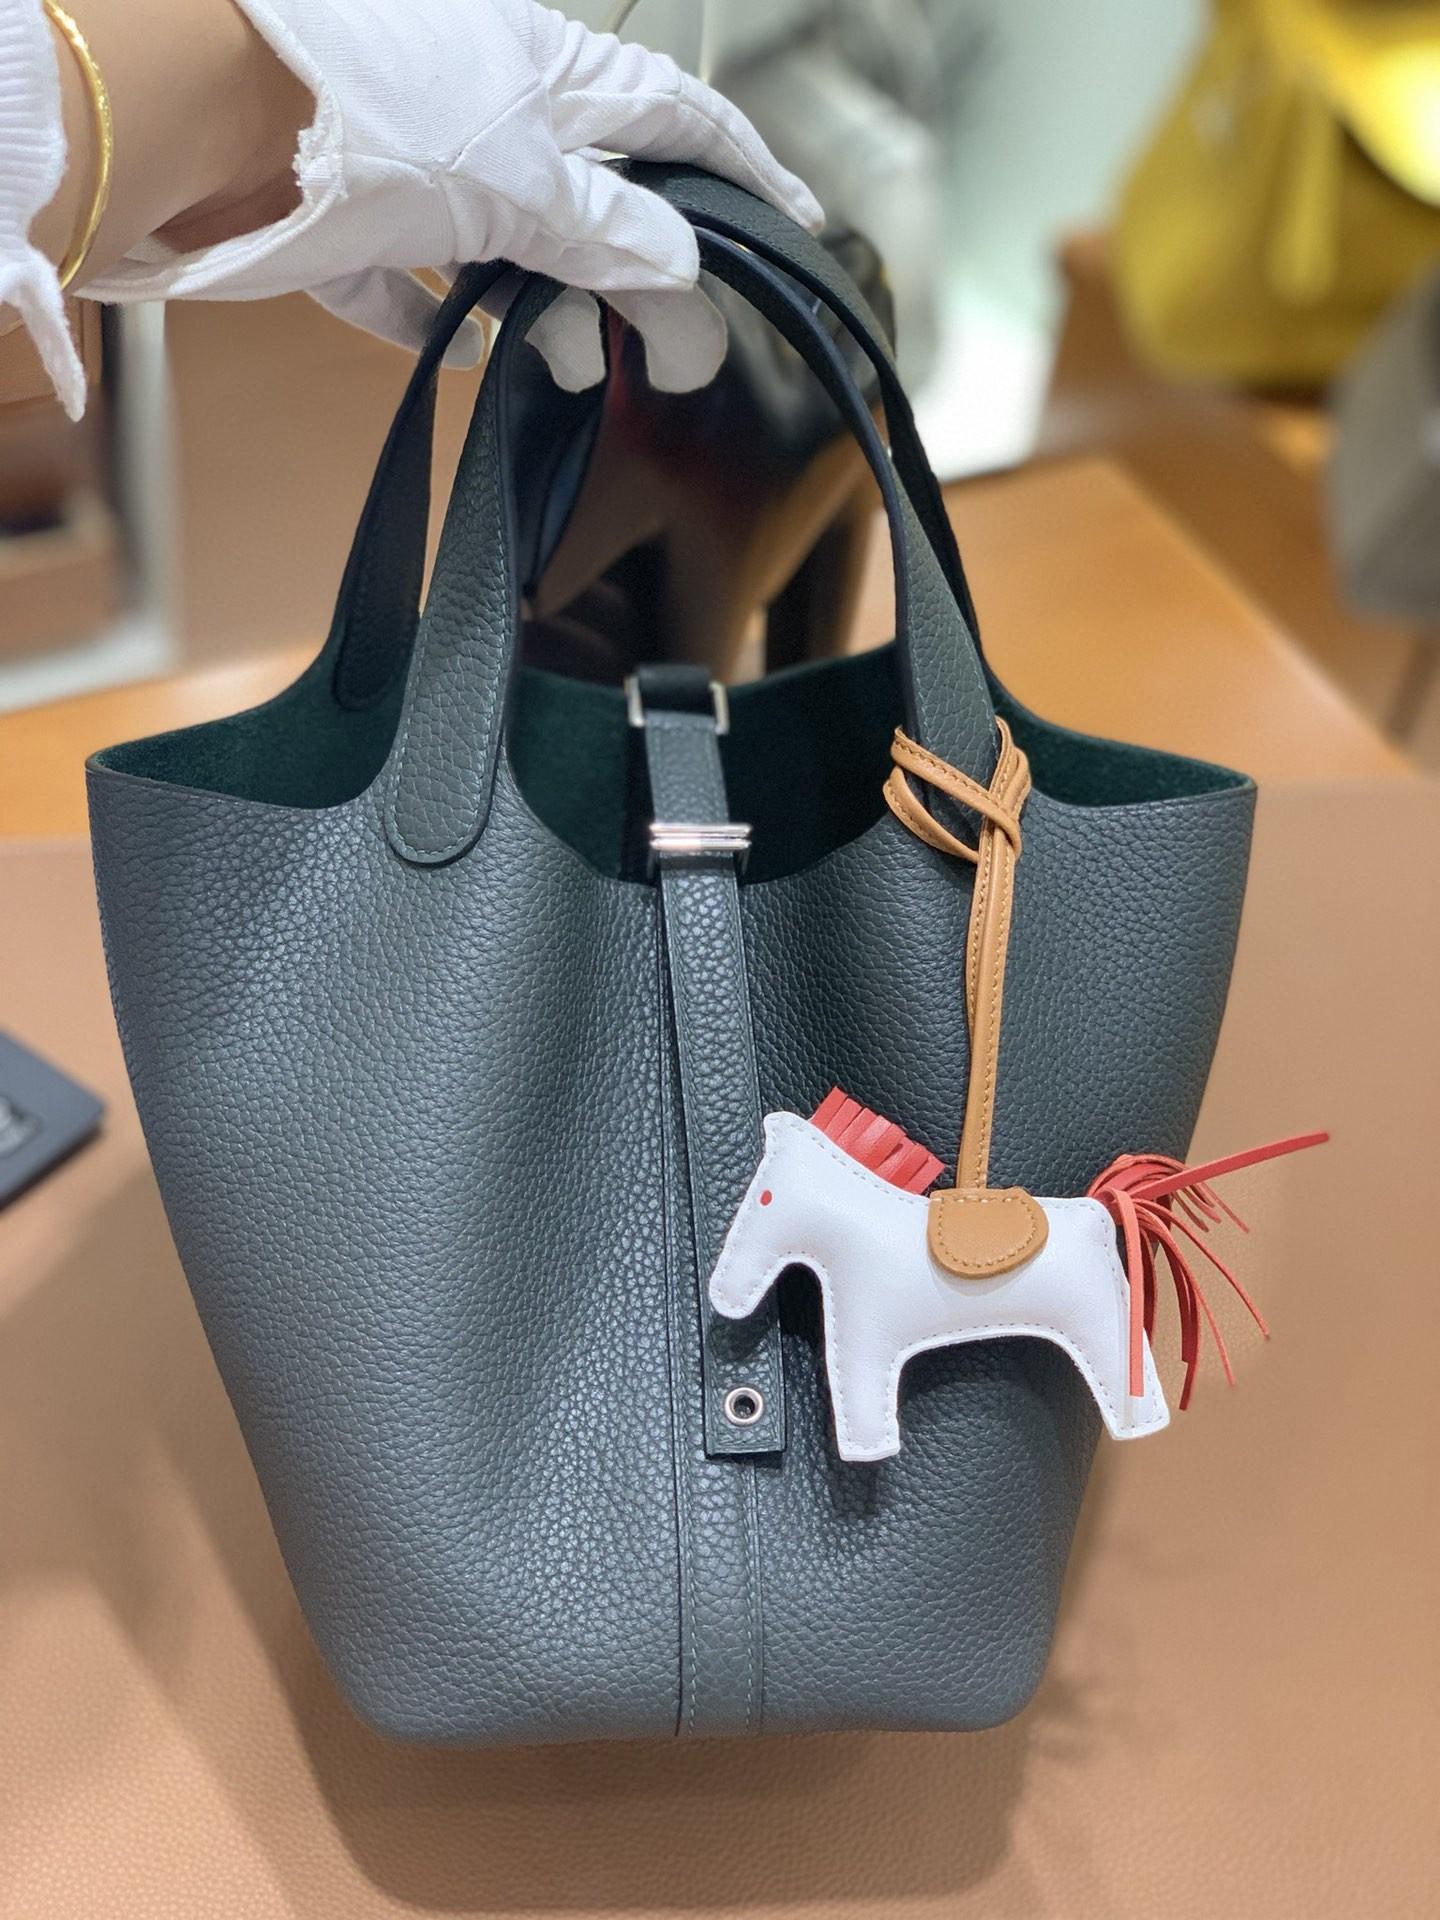 Hermès(爱马仕)Picotin 菜篮子 TC 6O松柏绿 18cm 银扣 现货